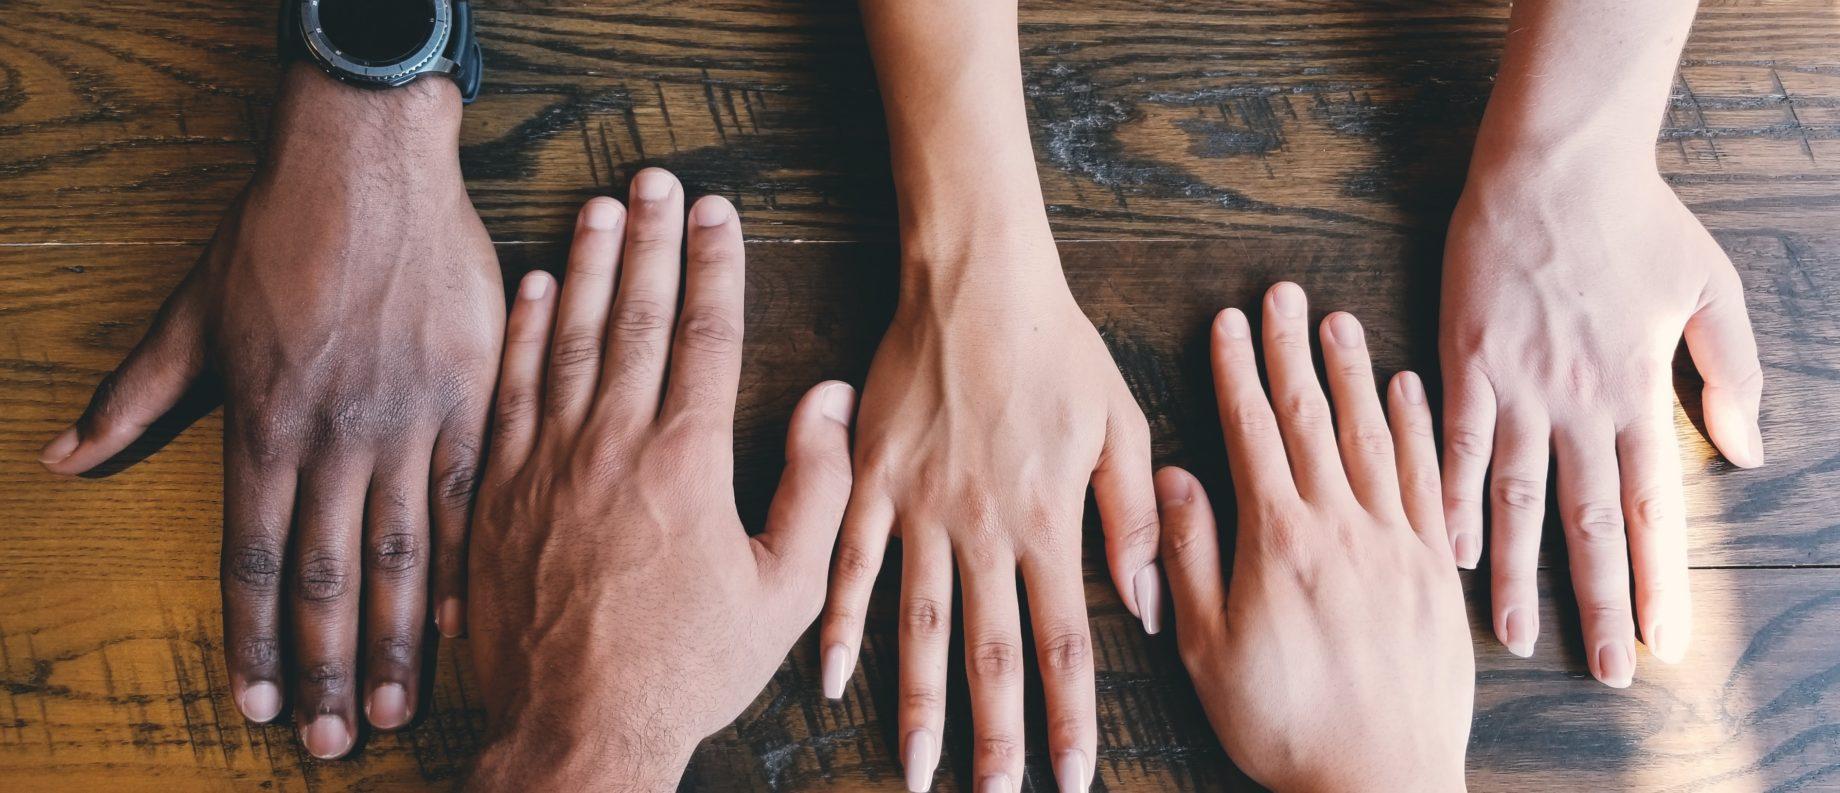 forming spiritual community